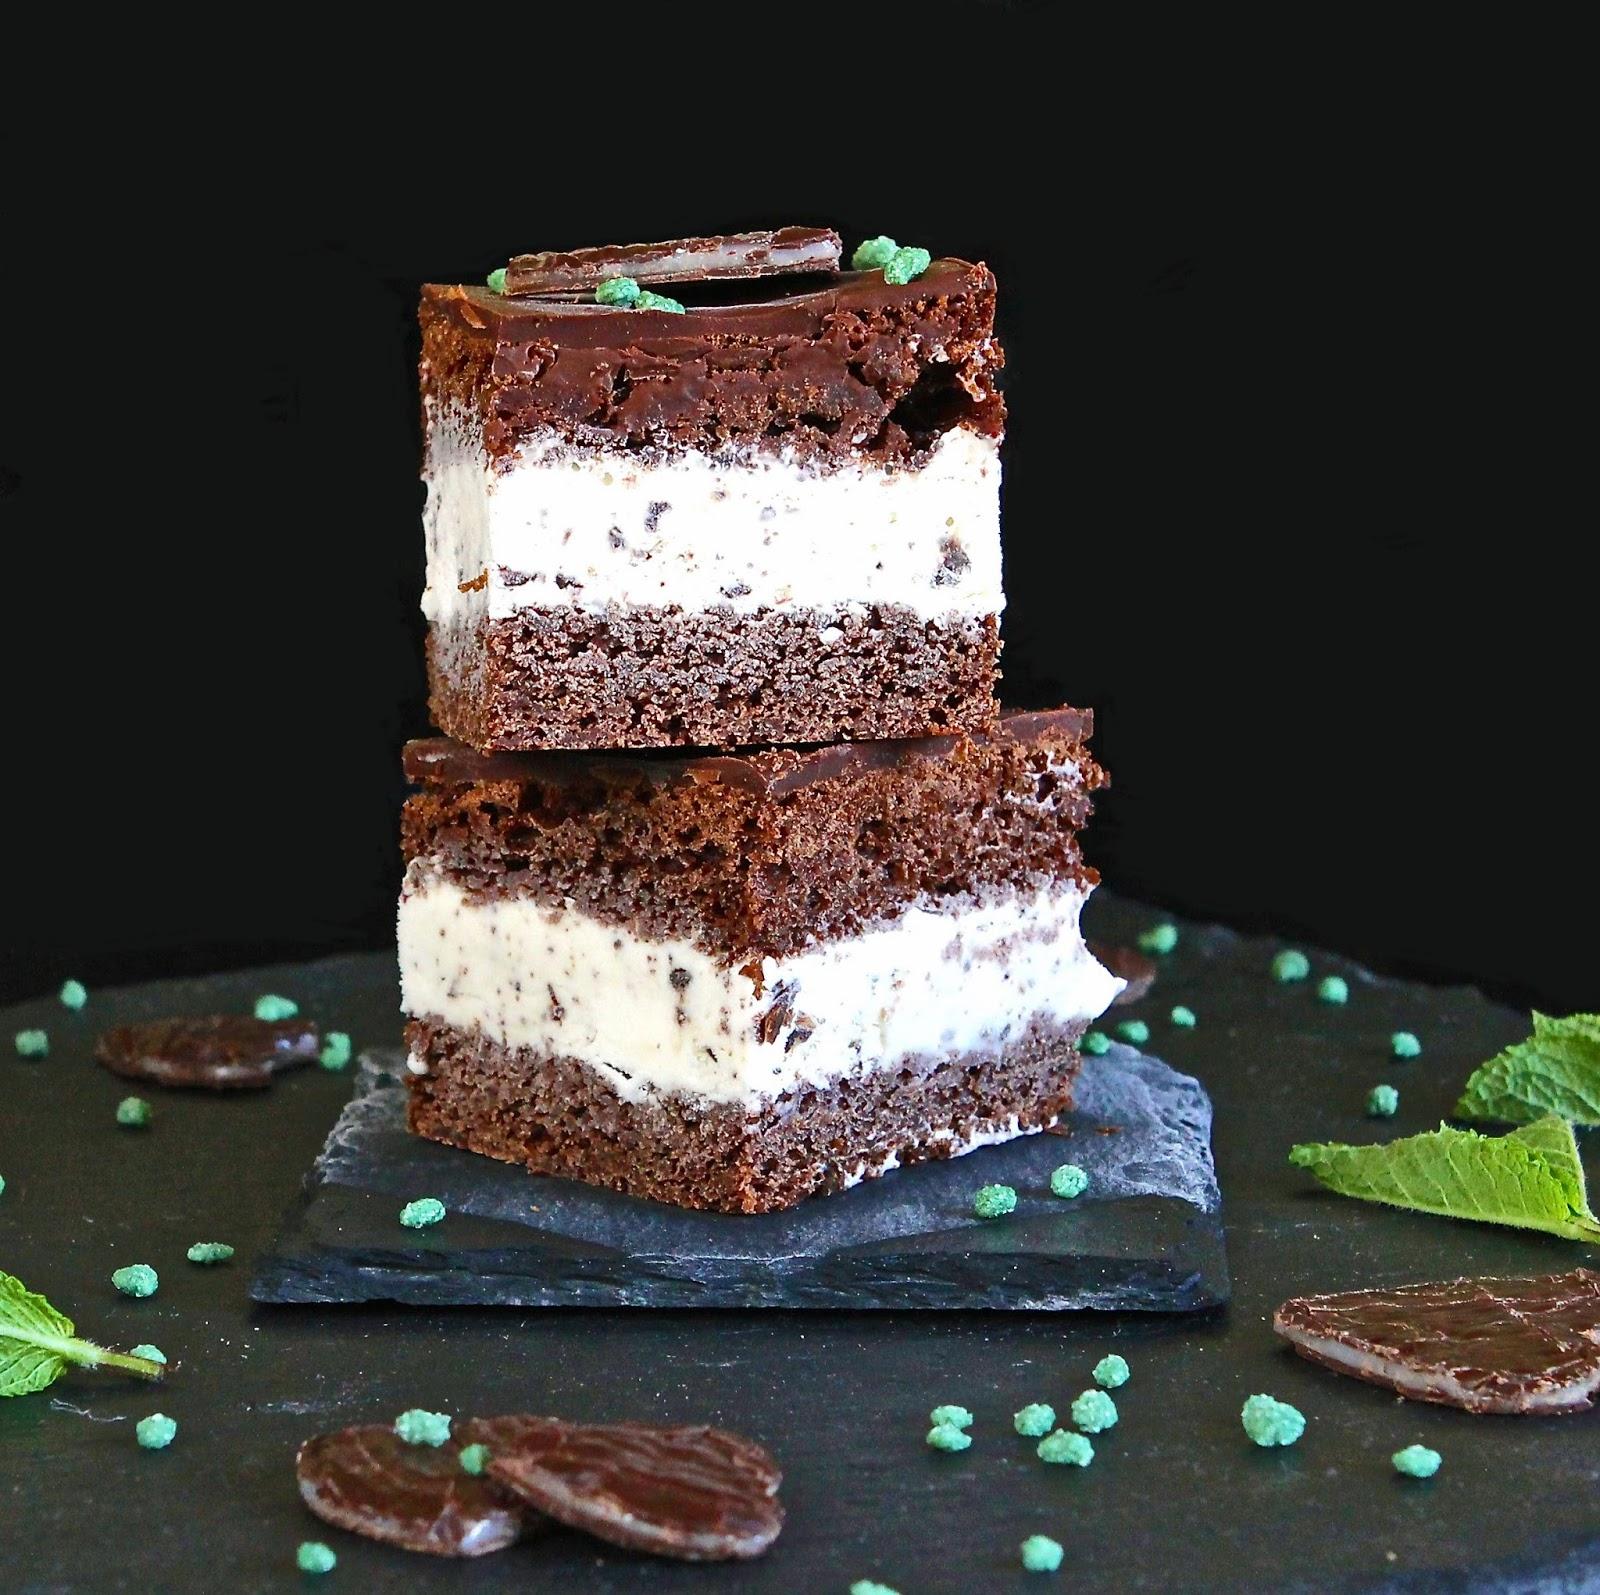 Sponge Cake Ice Cream Dessert